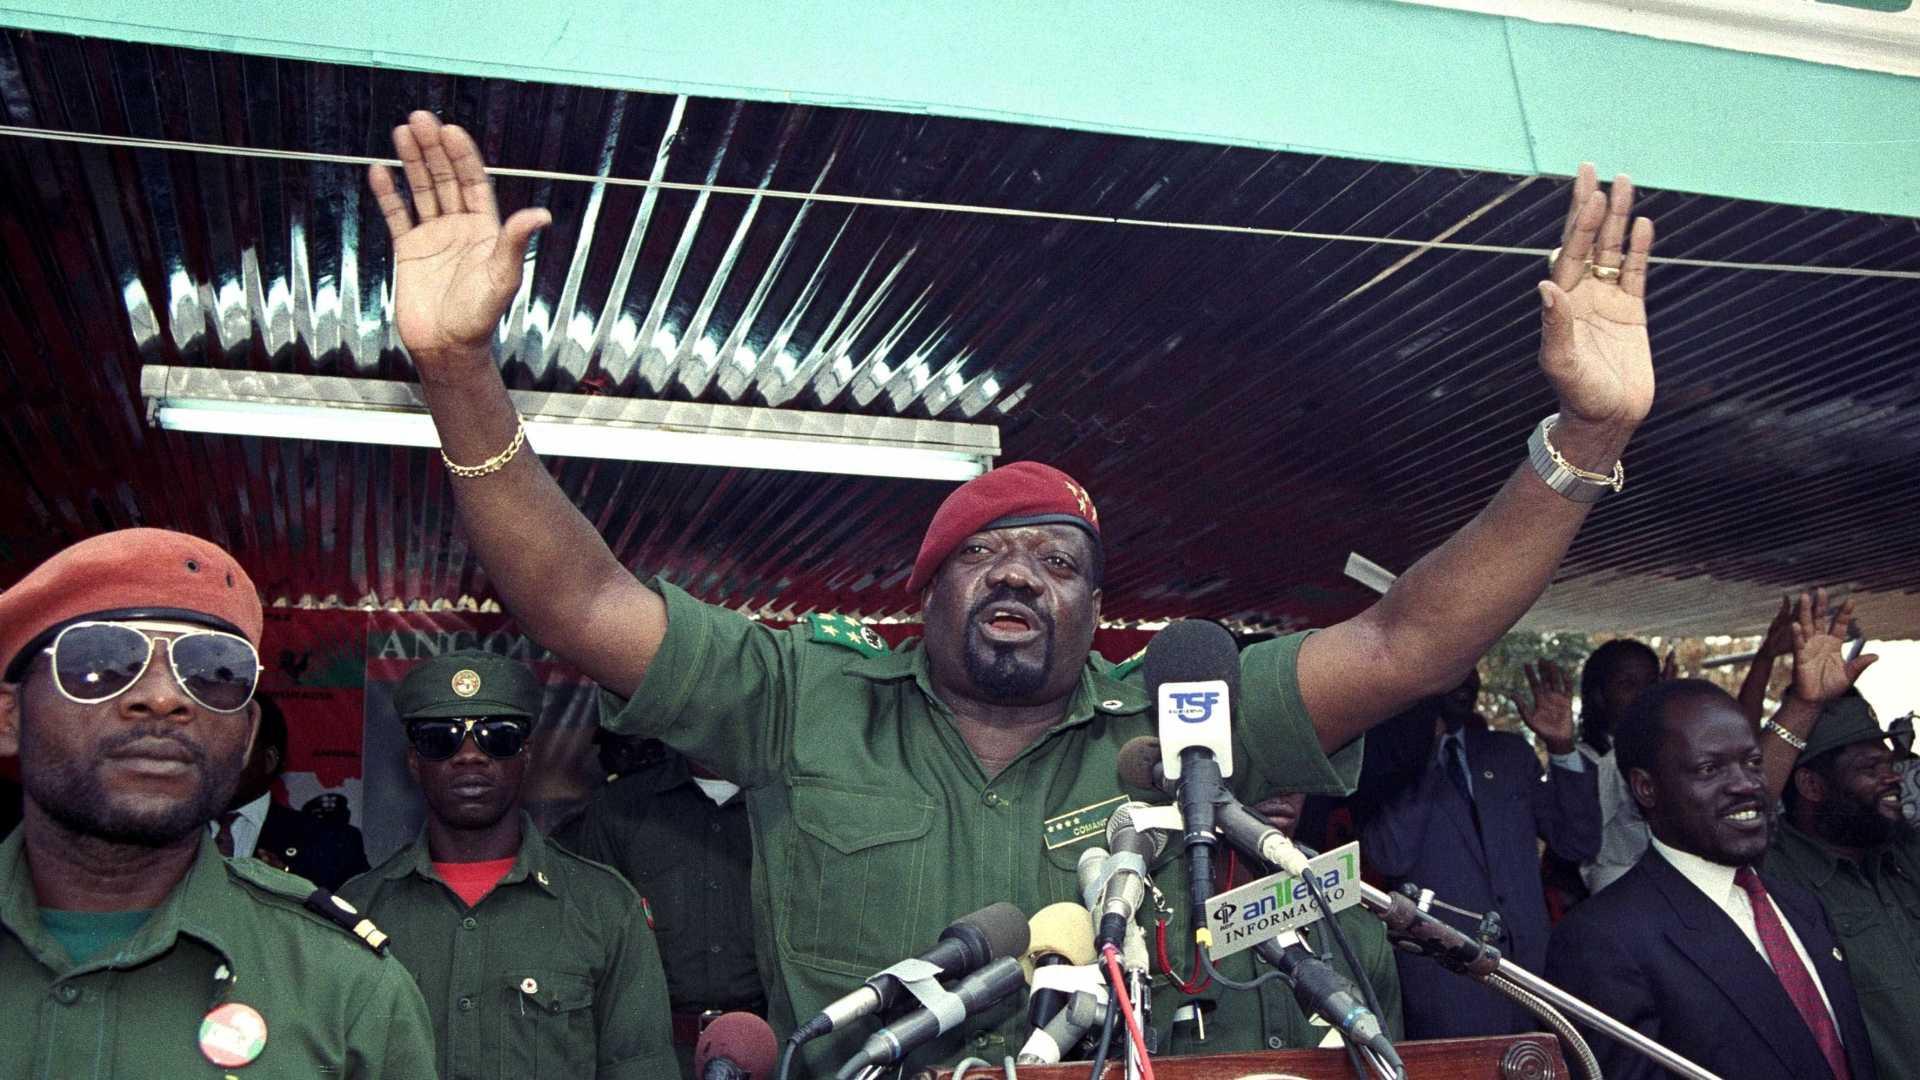 - SAVIMBI - Governo entrega restos mortais de Savimbi este mês